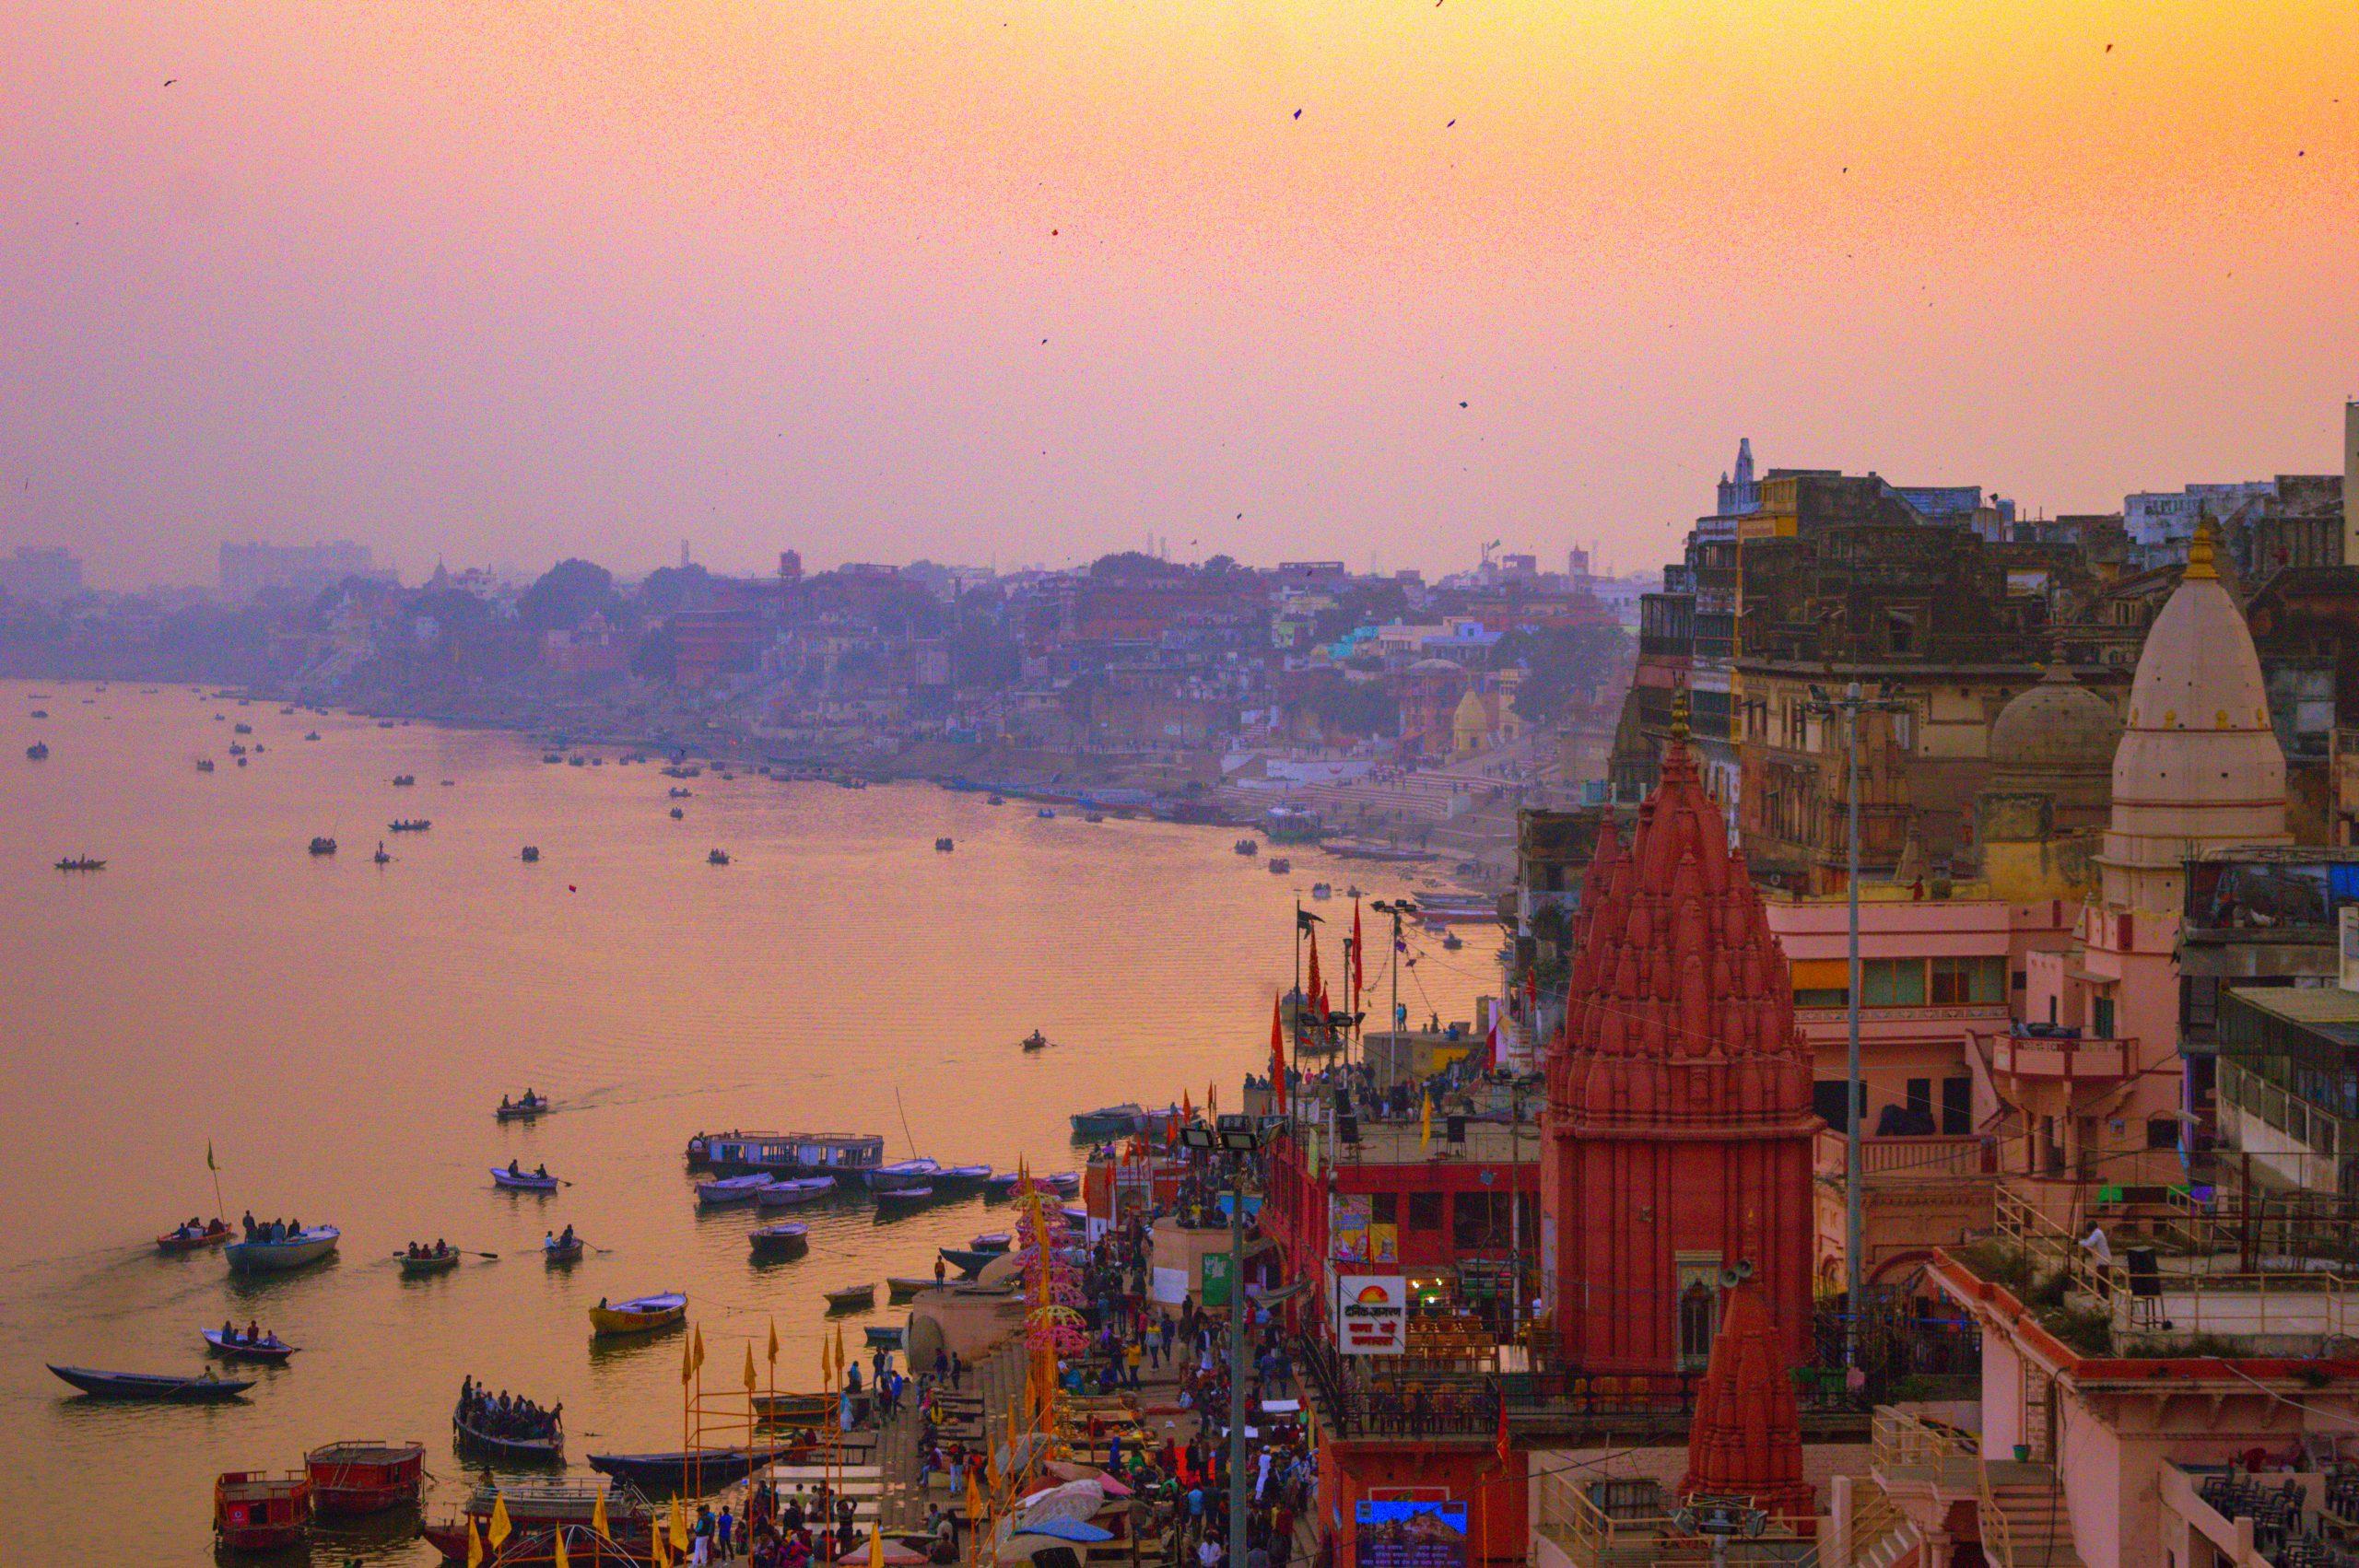 Rajendra Prasad Ghat at Varanasi